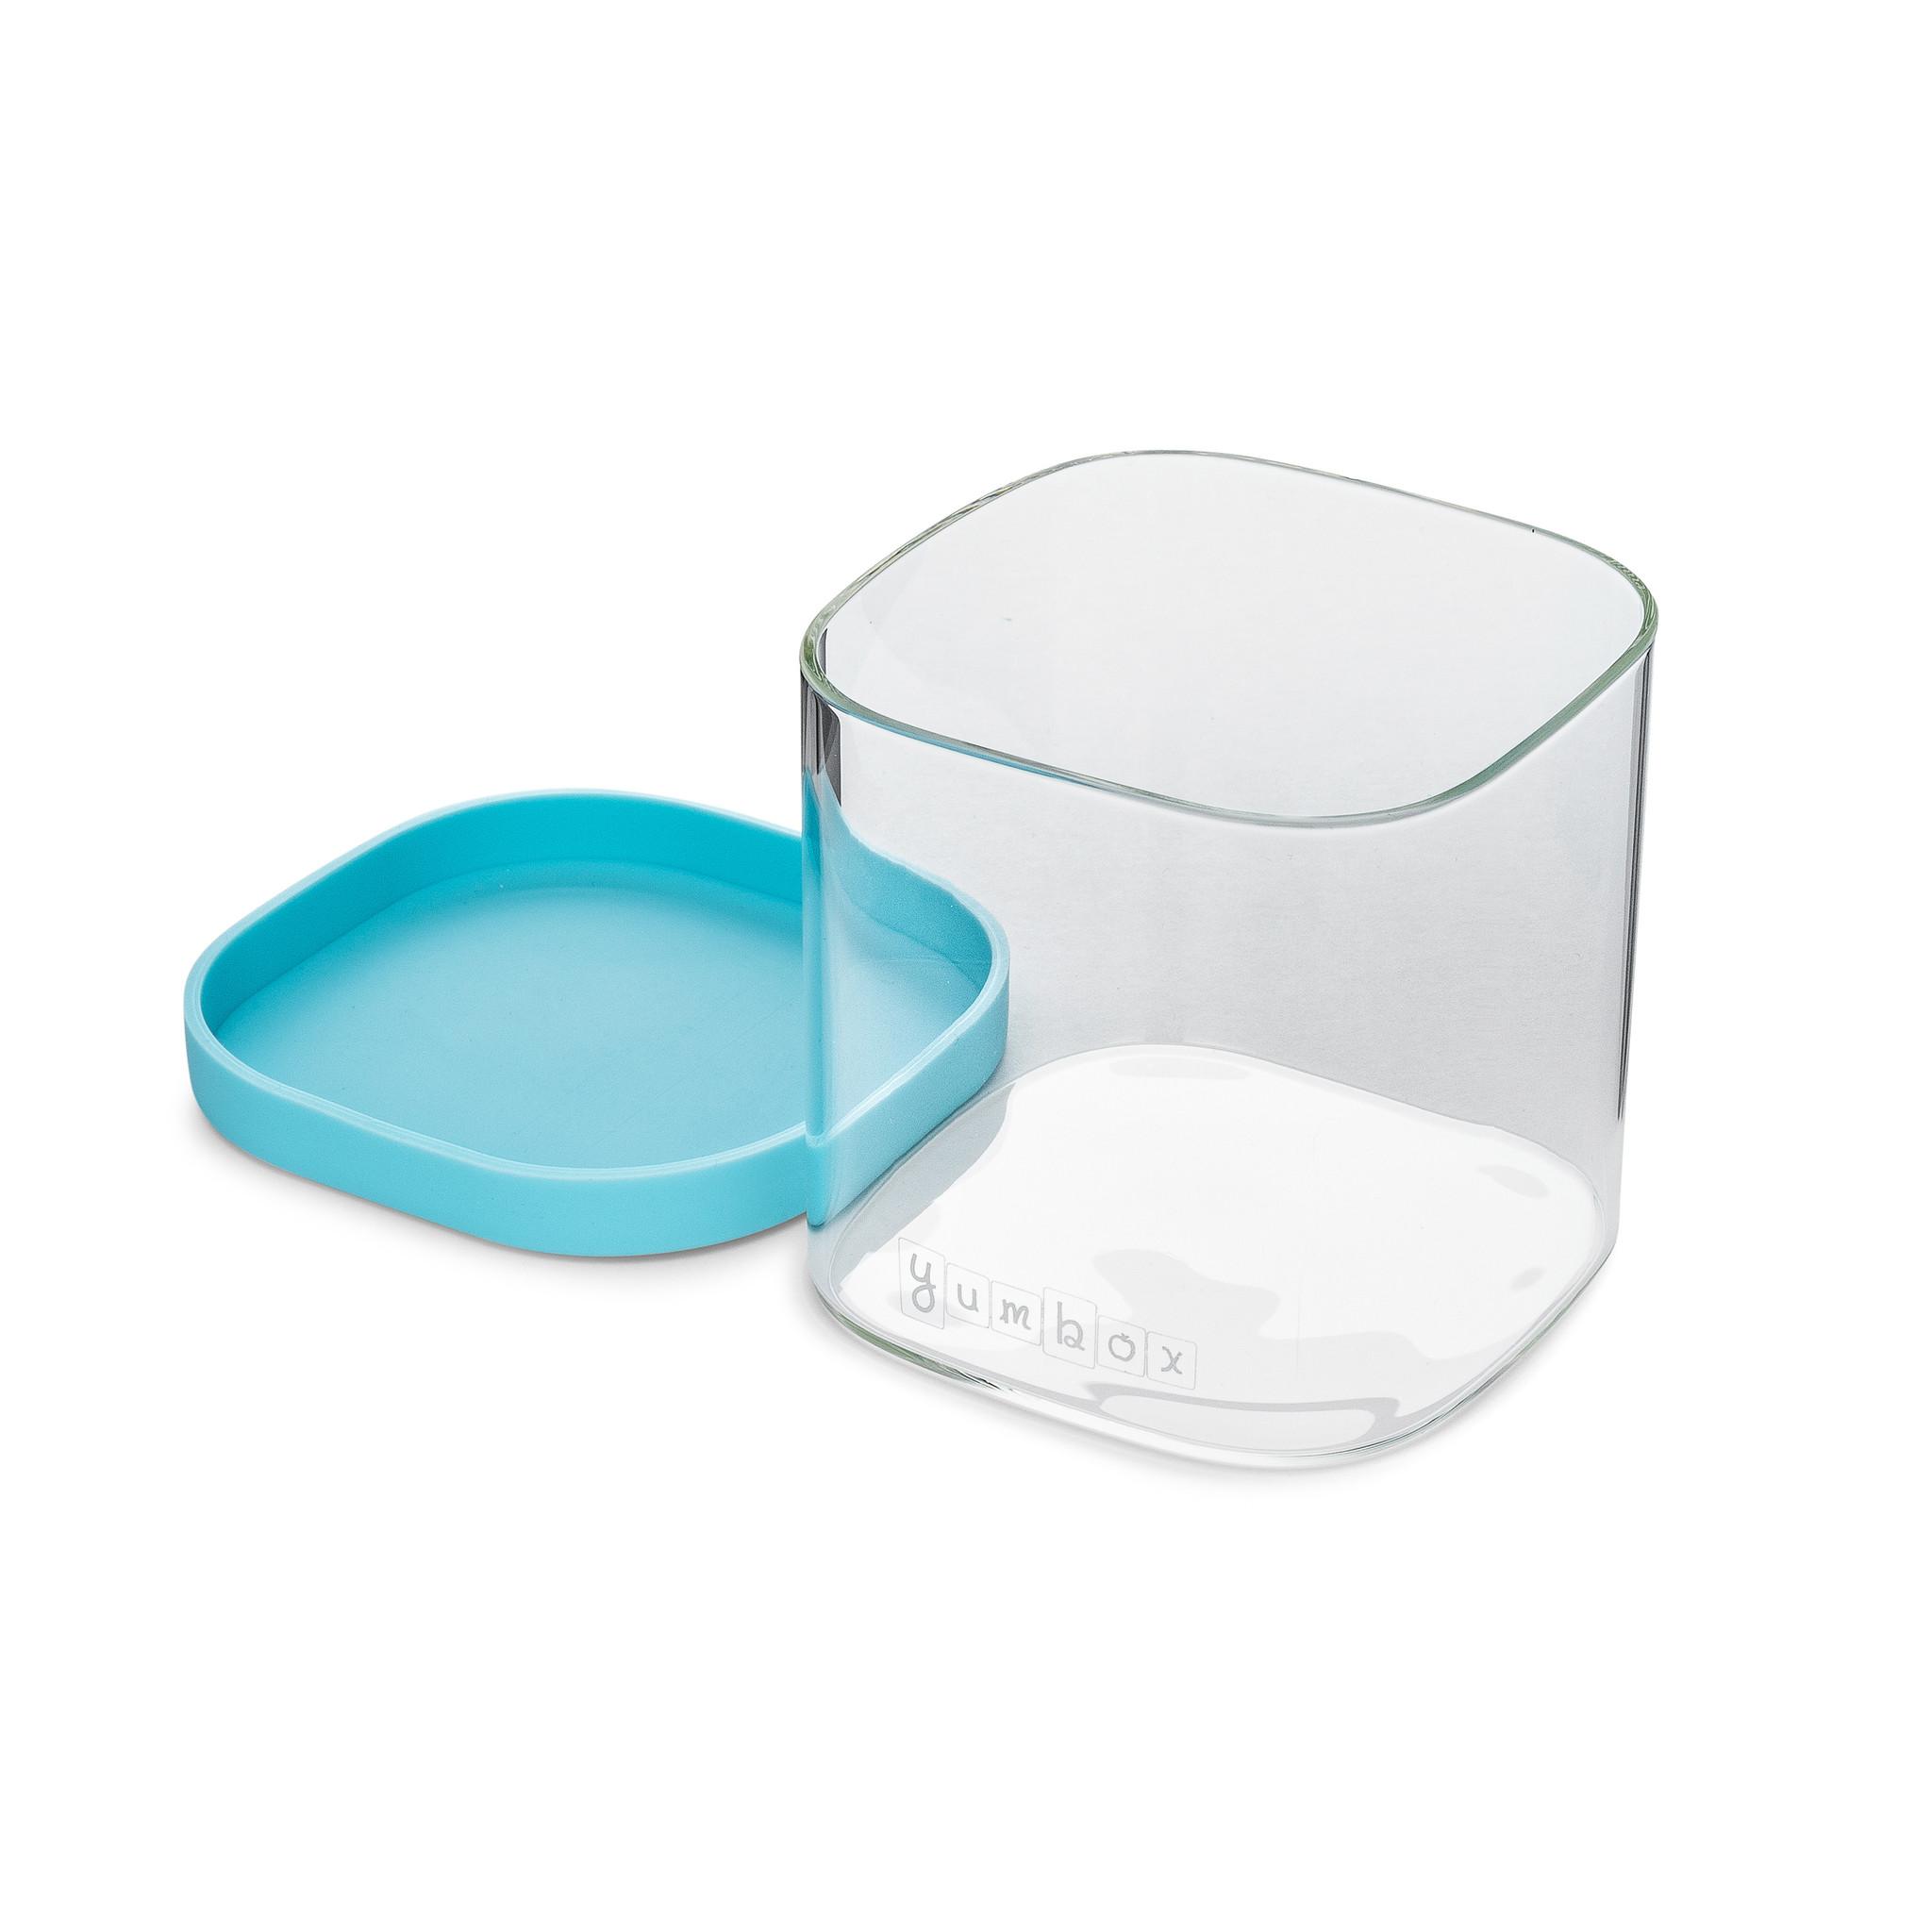 Yumbox Chop Chop 3 glass cubes Crisp-6